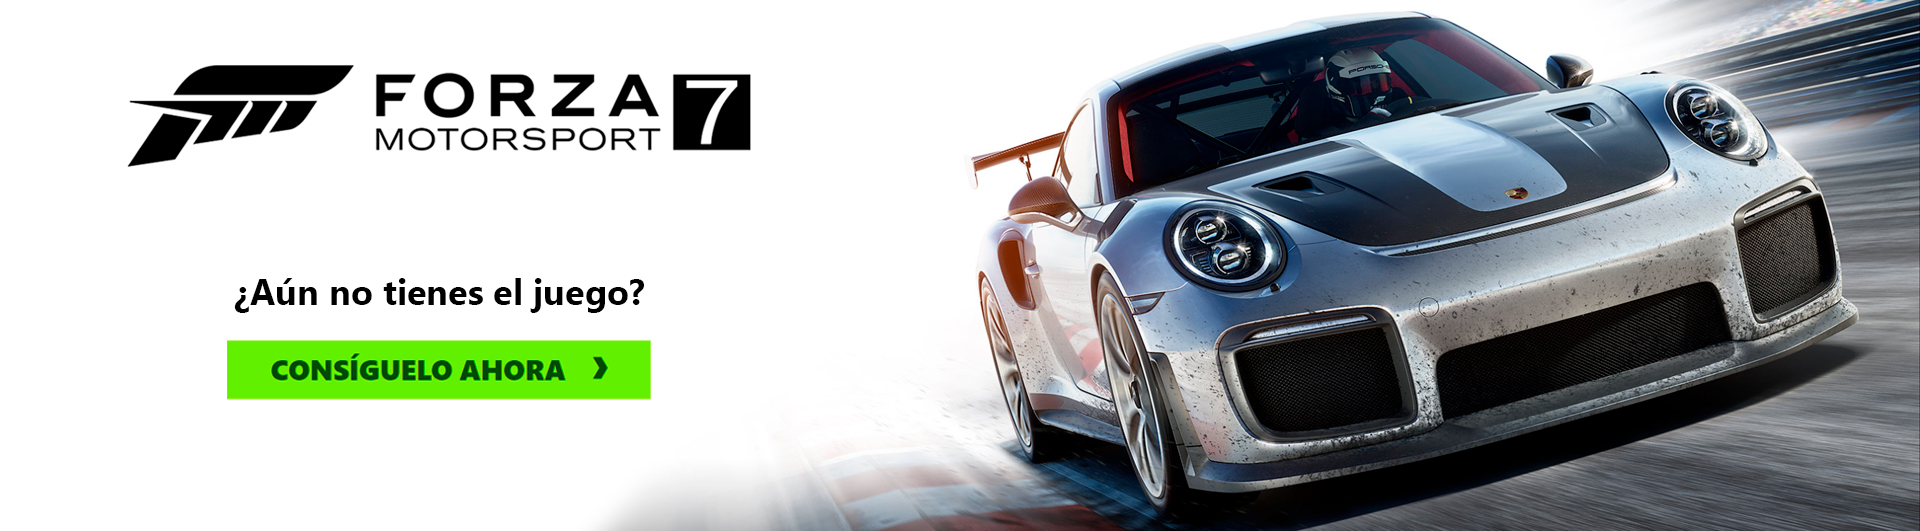 Forza_Motorsport_7